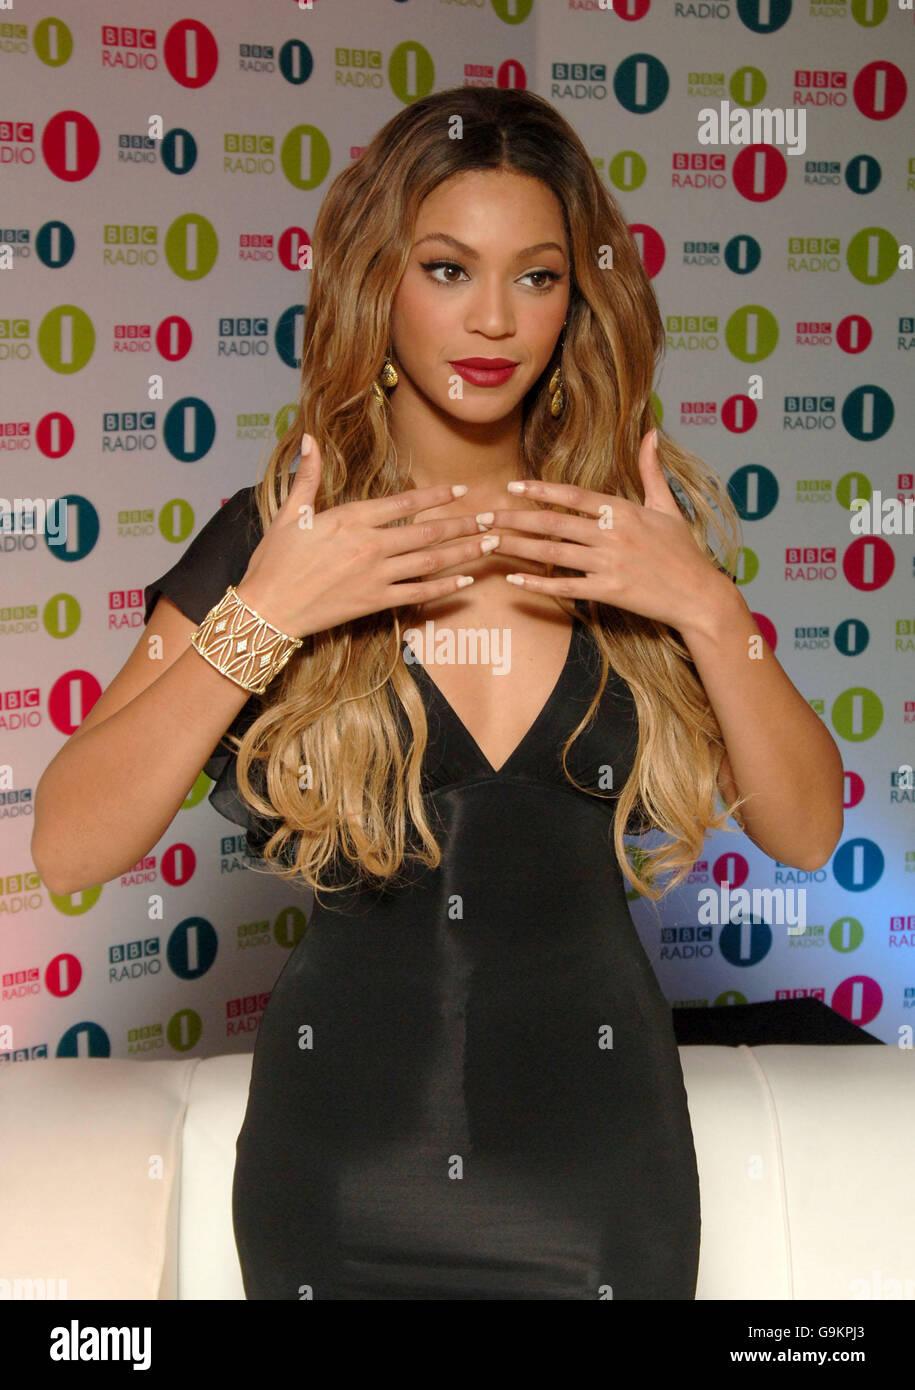 Bbc Radio 1 Chart Show Live Stock Photo 109228955 Alamy